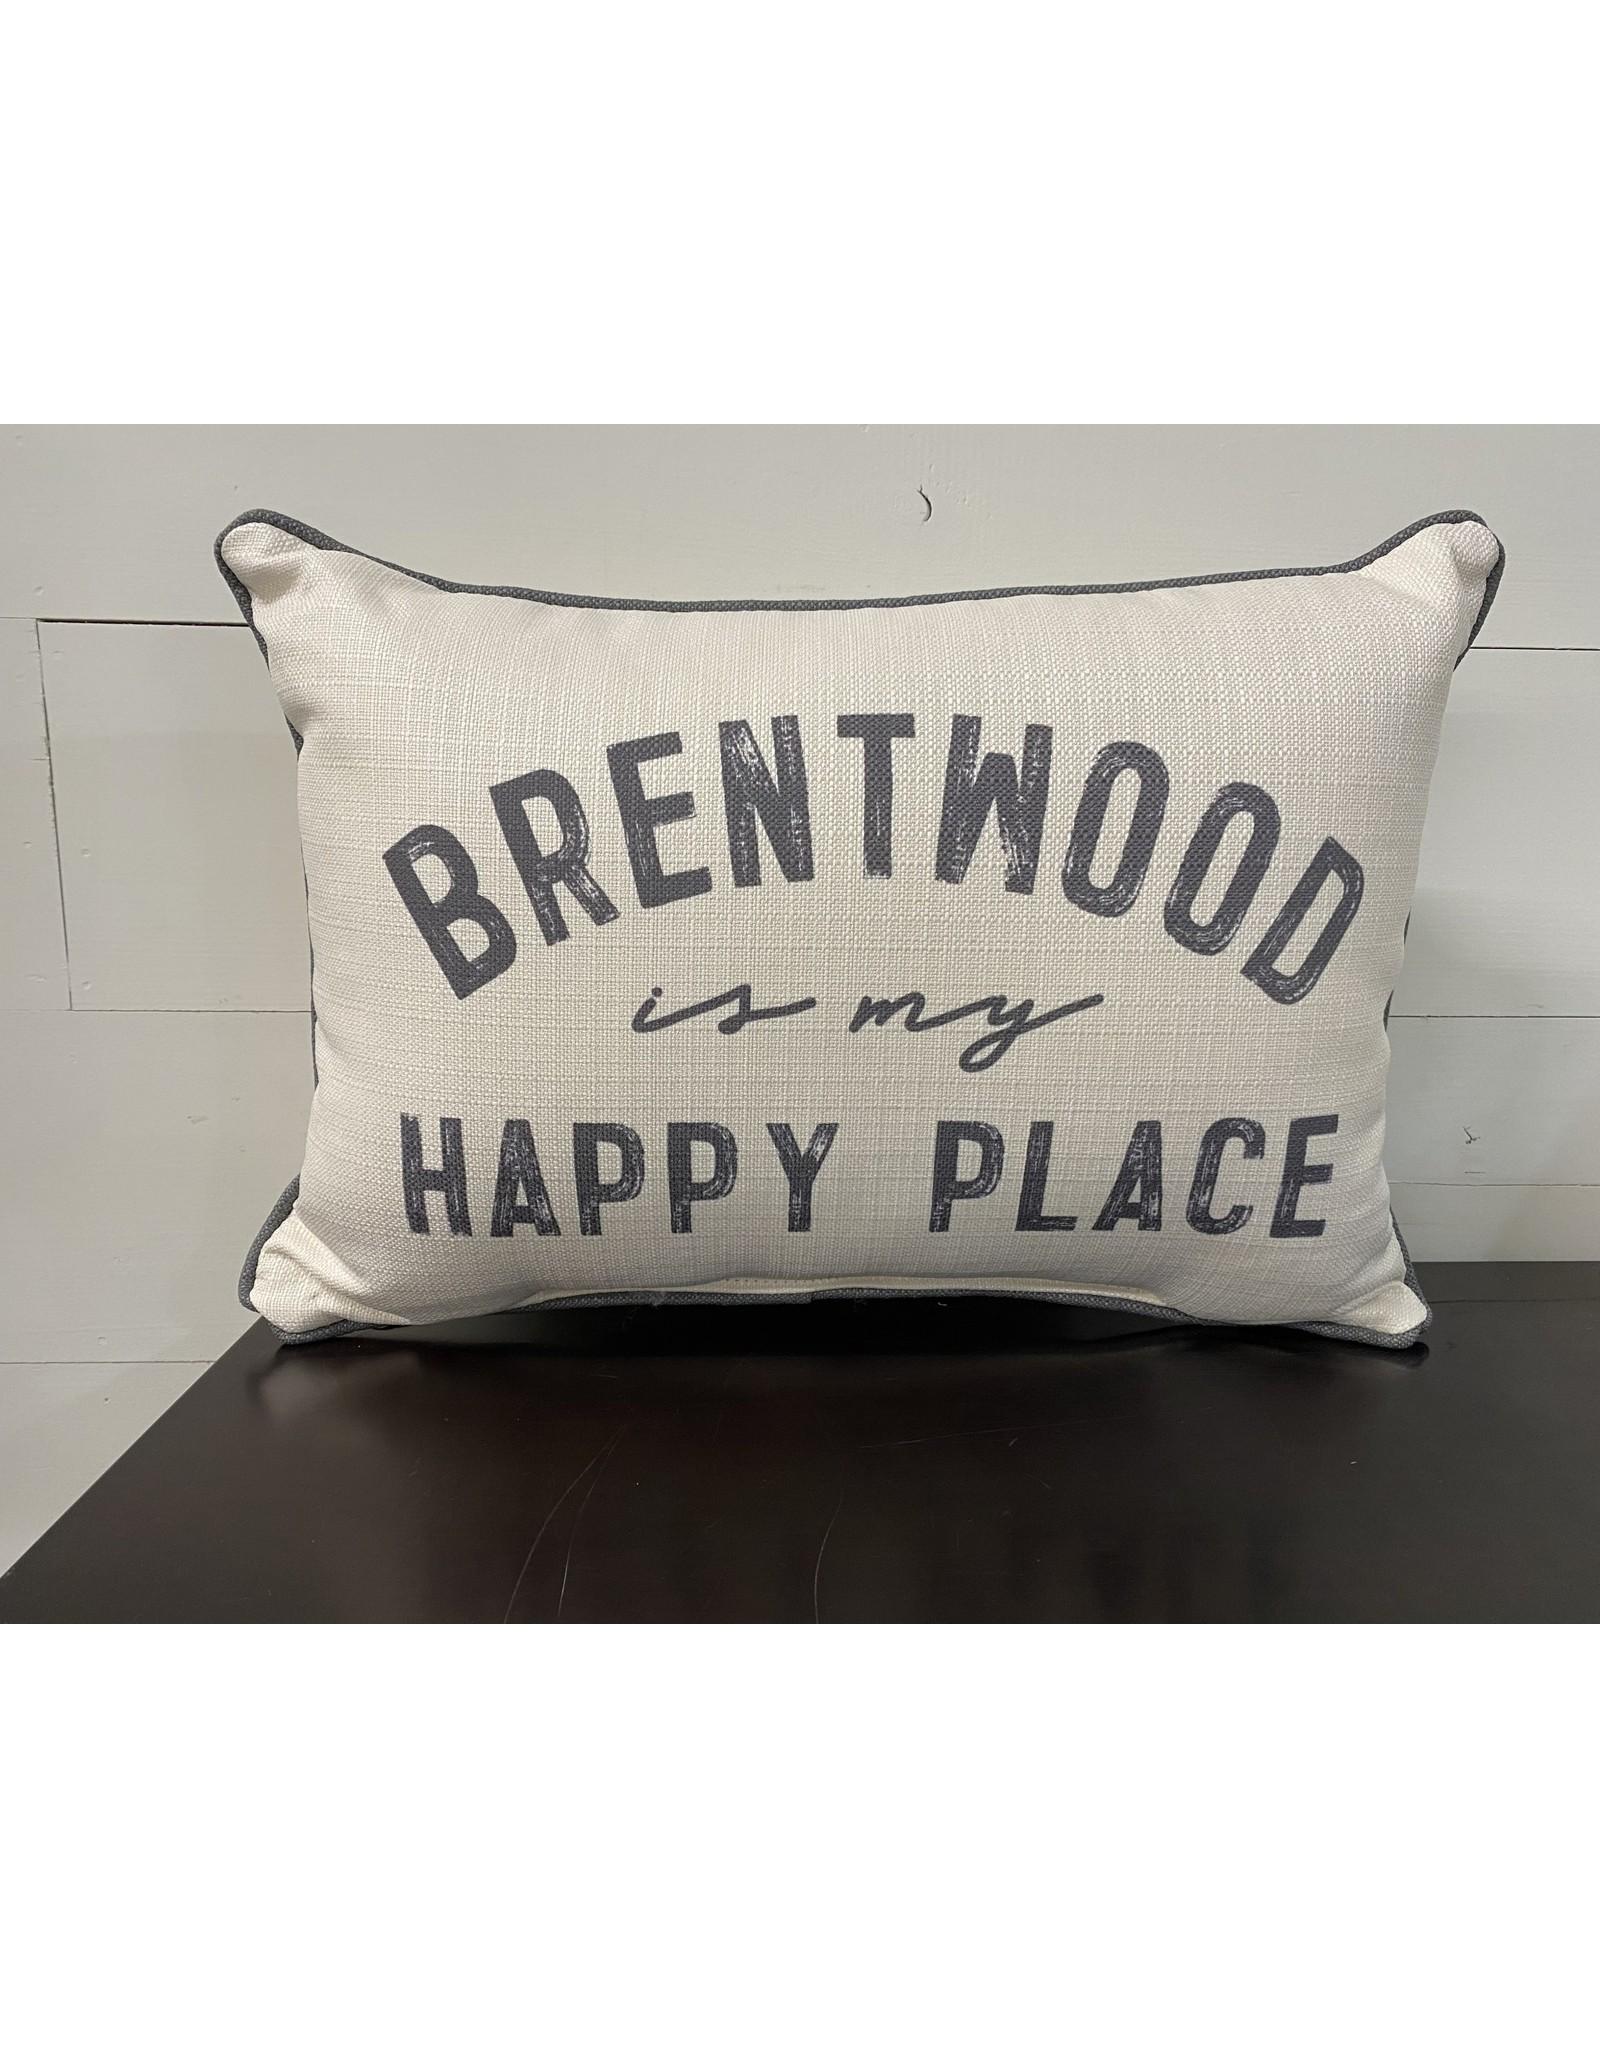 Little Birdie Brentwood Is My Happy Place-Grey Tones